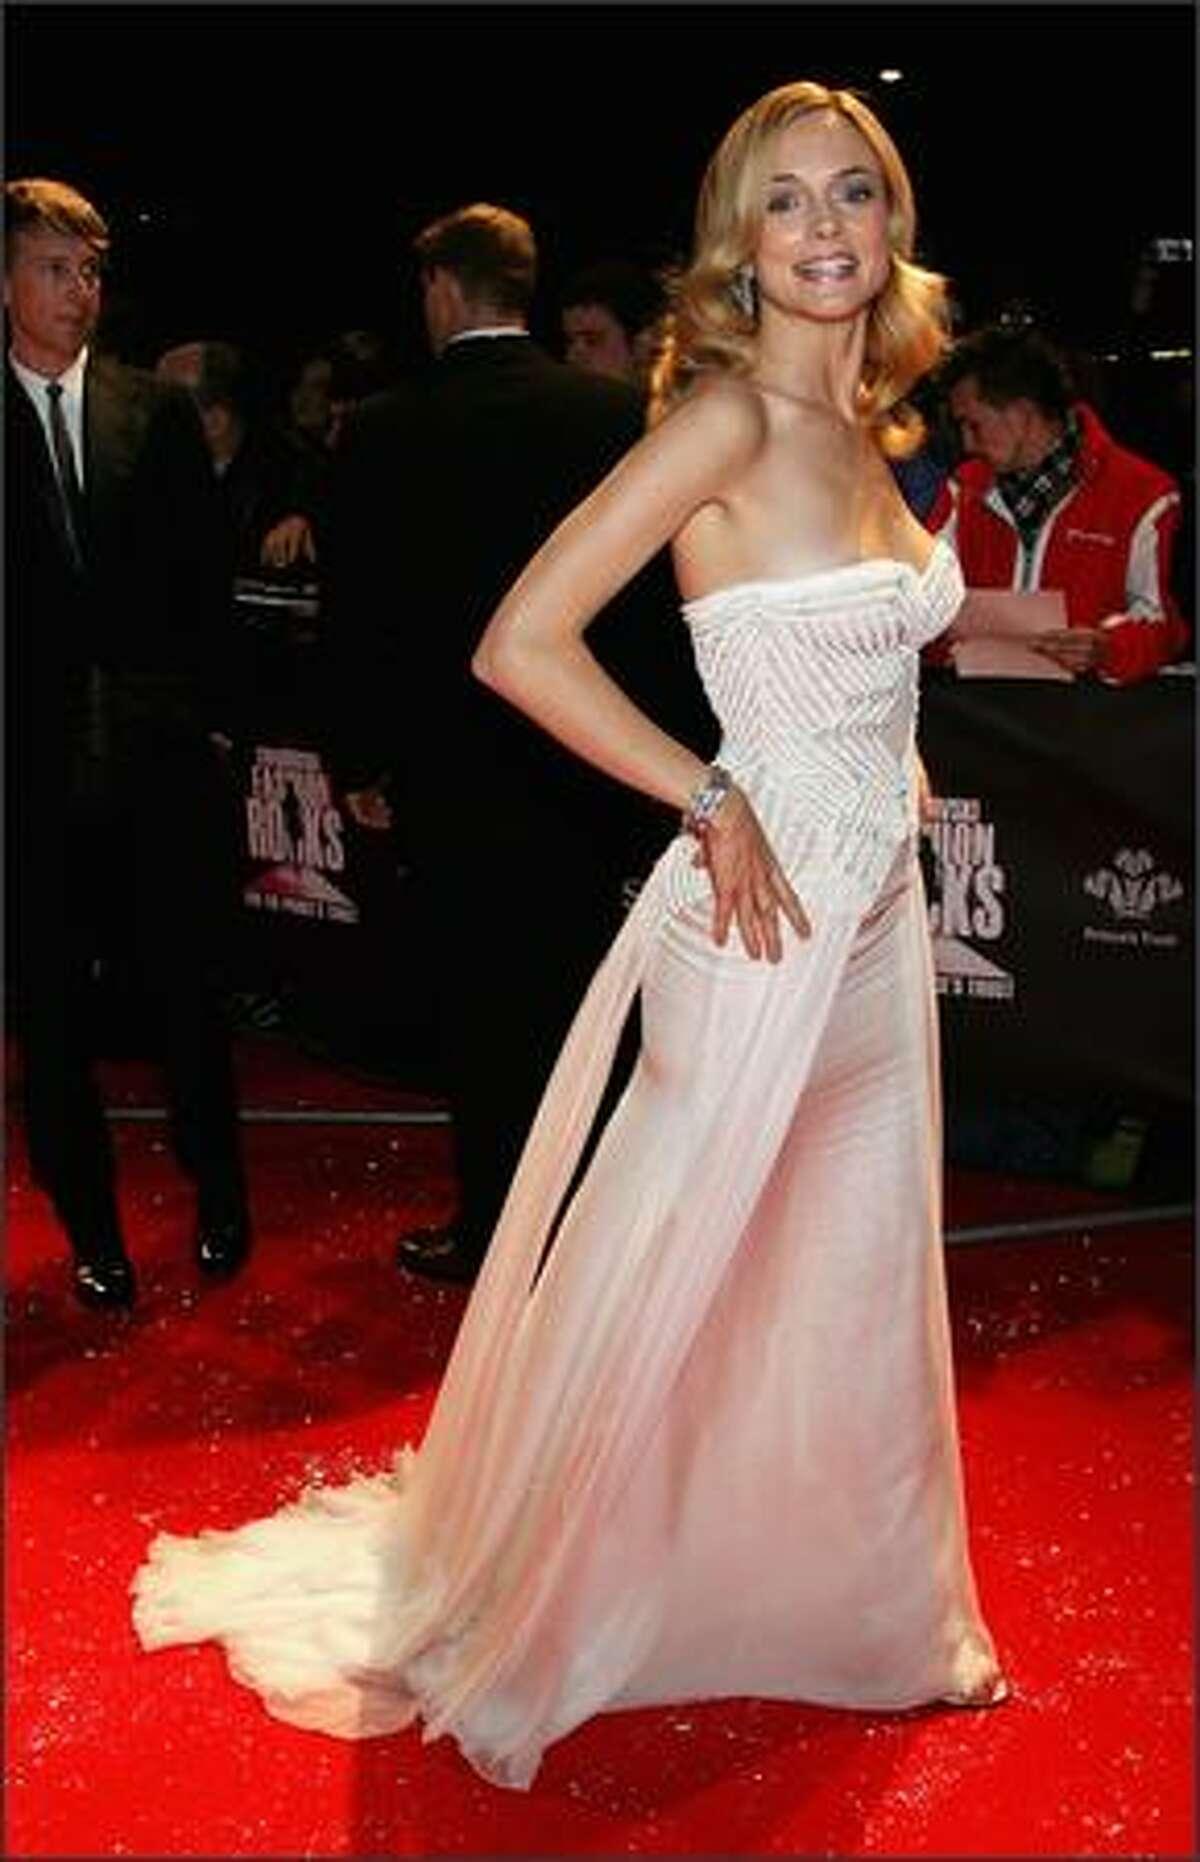 Heather Graham arrives at the Swarovski Fashion Rocks concert at the Royal Albert Hall on October 18, 2007 in London, England.